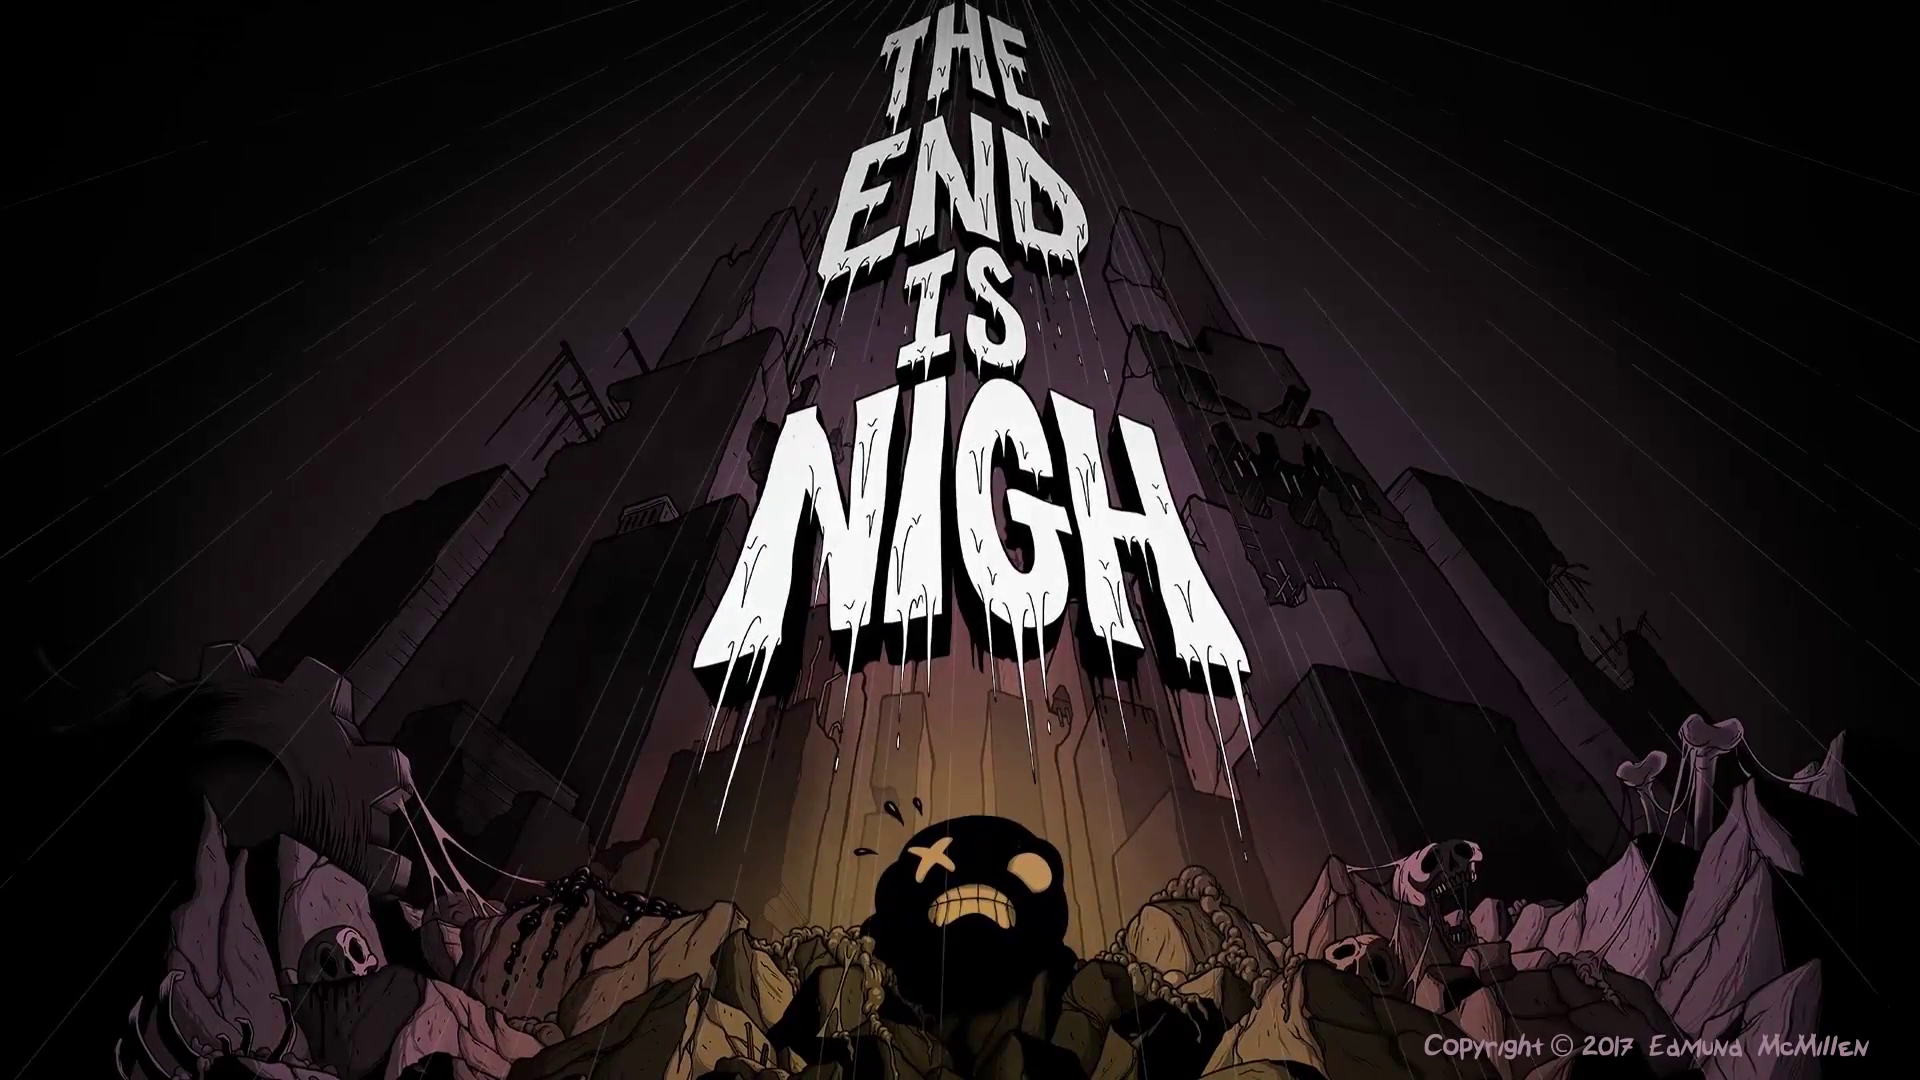 3 The End Is Nigh Fondos De Pantalla Hd Fondos De